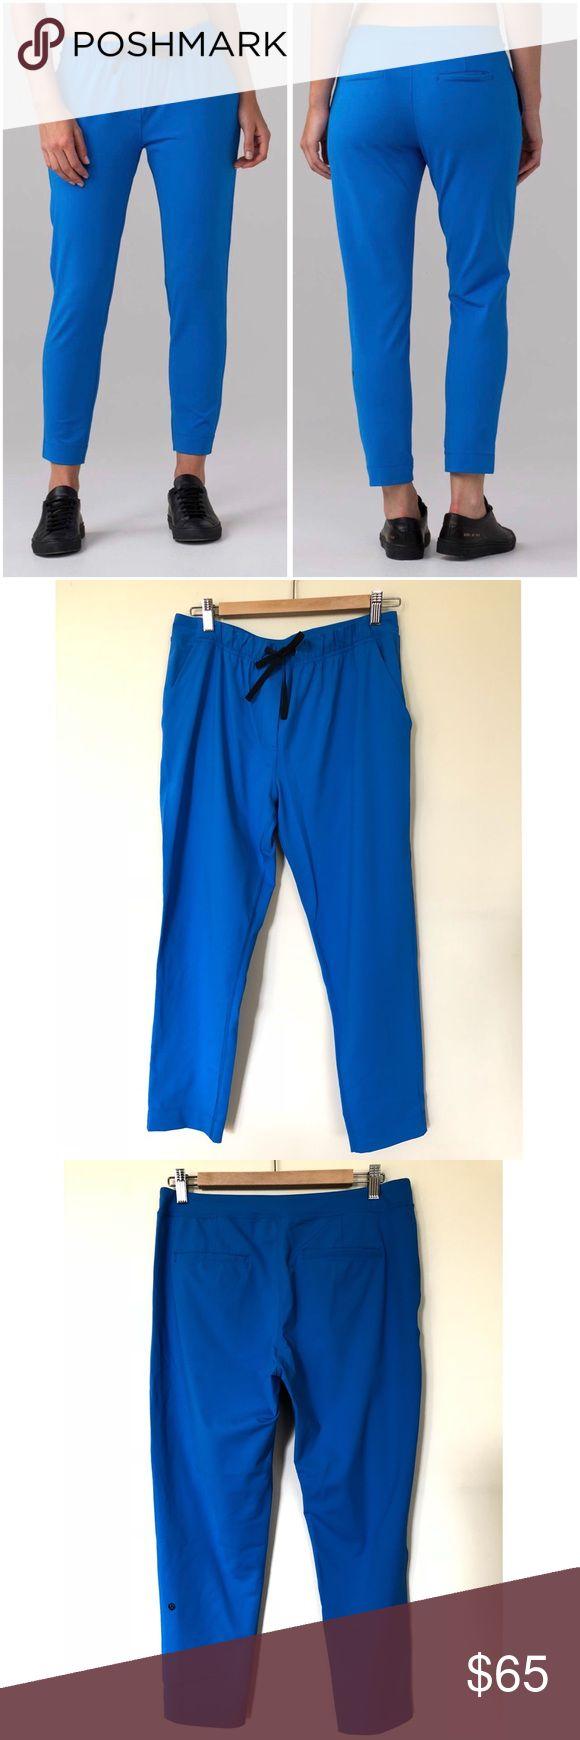 178880580 NWOT Lululemon Jet Crop Slim Pant Lululemon Jet Crop Slim Pant (New without  Tags)